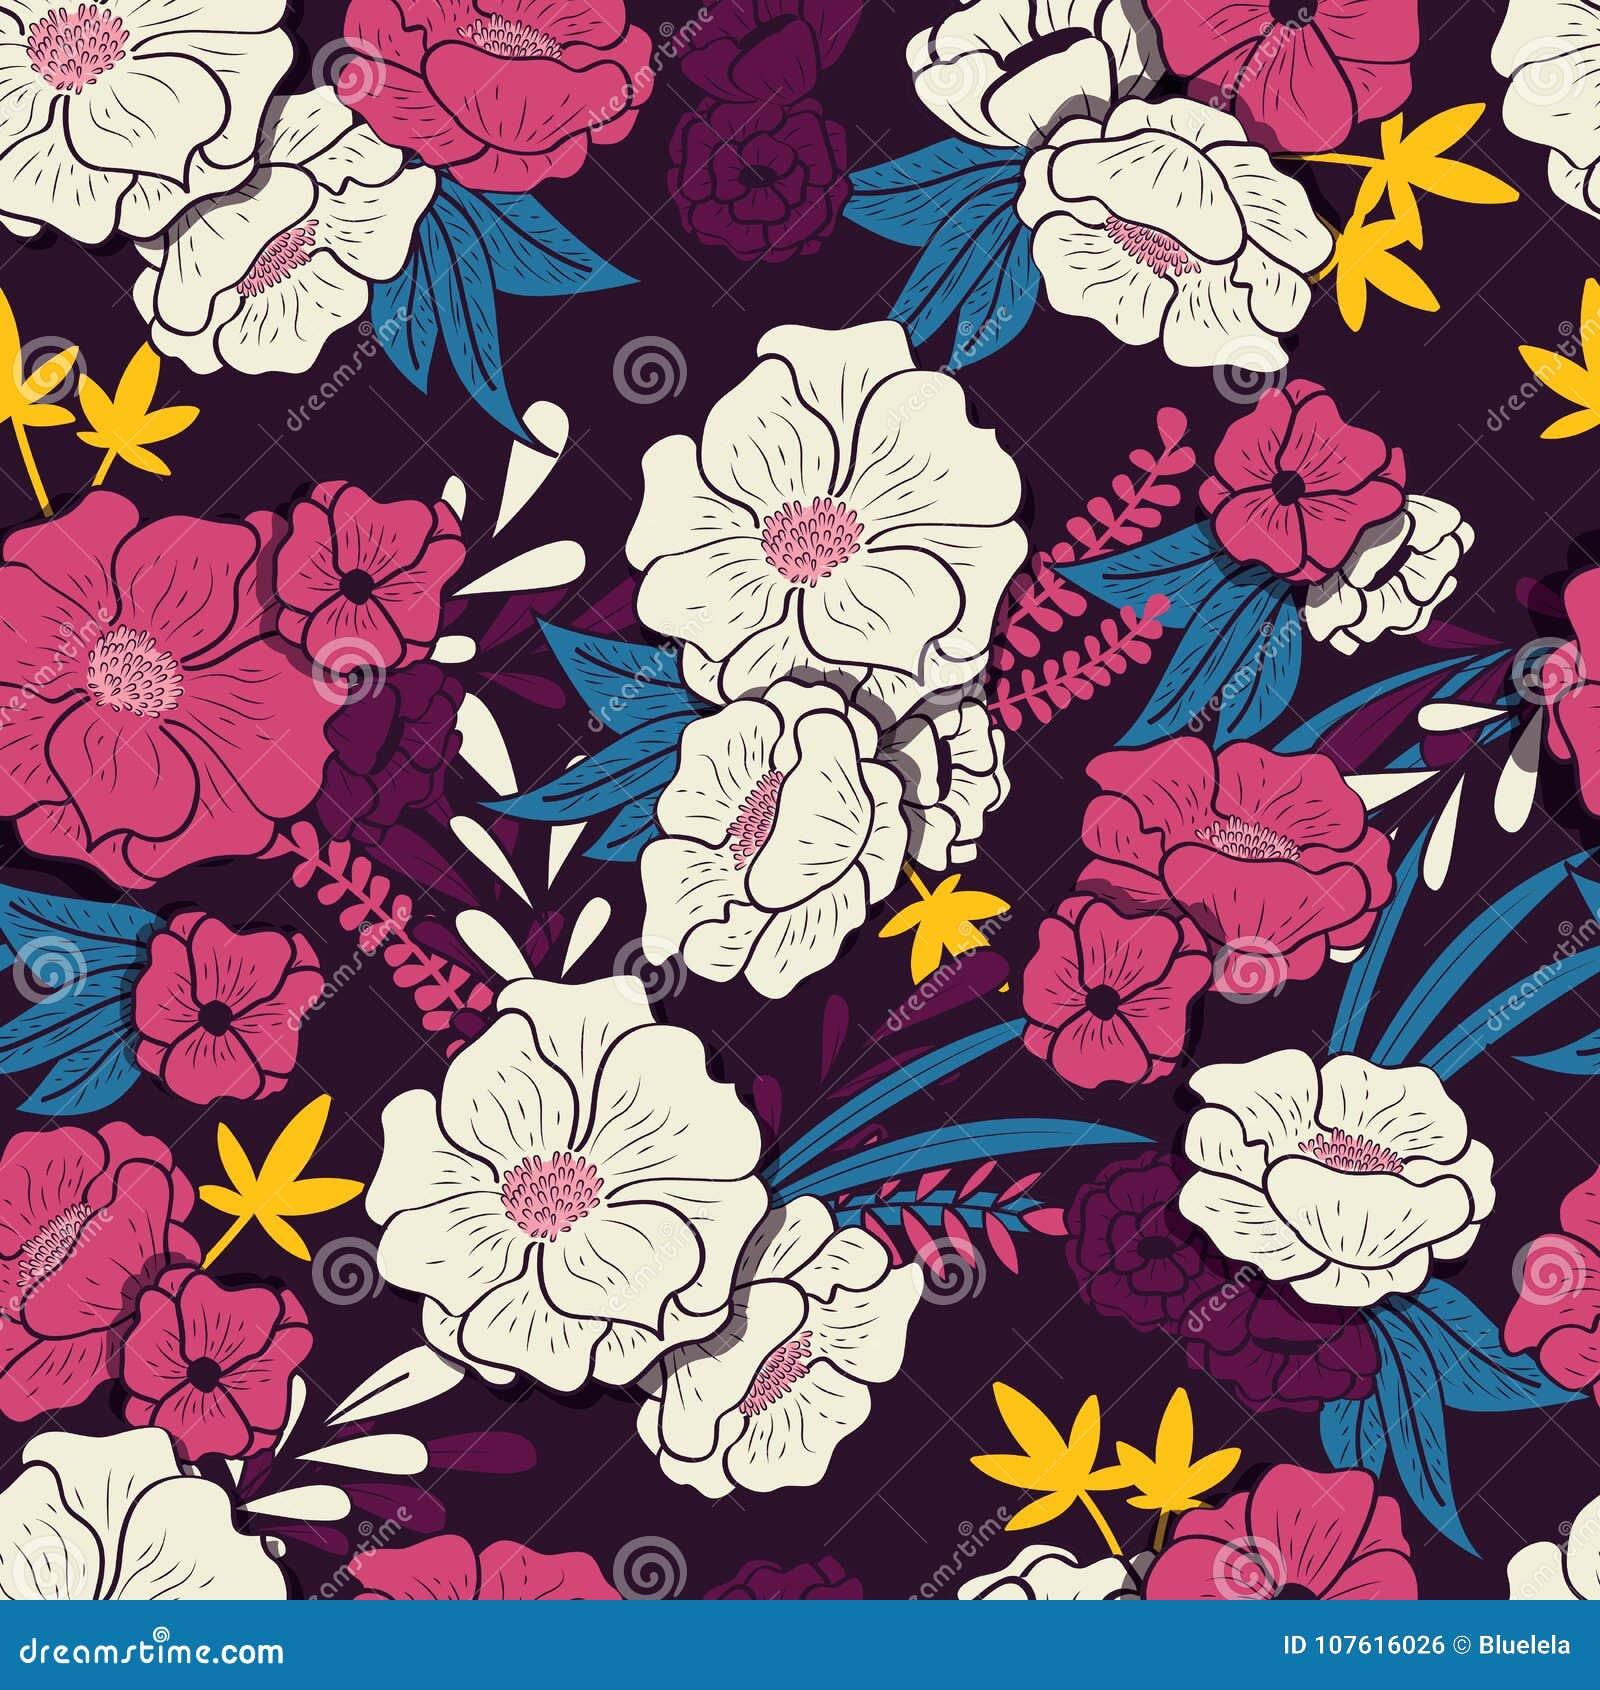 Floral ζούγκλα με το άνευ ραφής σχέδιο φιδιών, τα τροπικά λουλούδια και τα φύλλα, βοτανικό χέρι που σύρεται δονούμενο